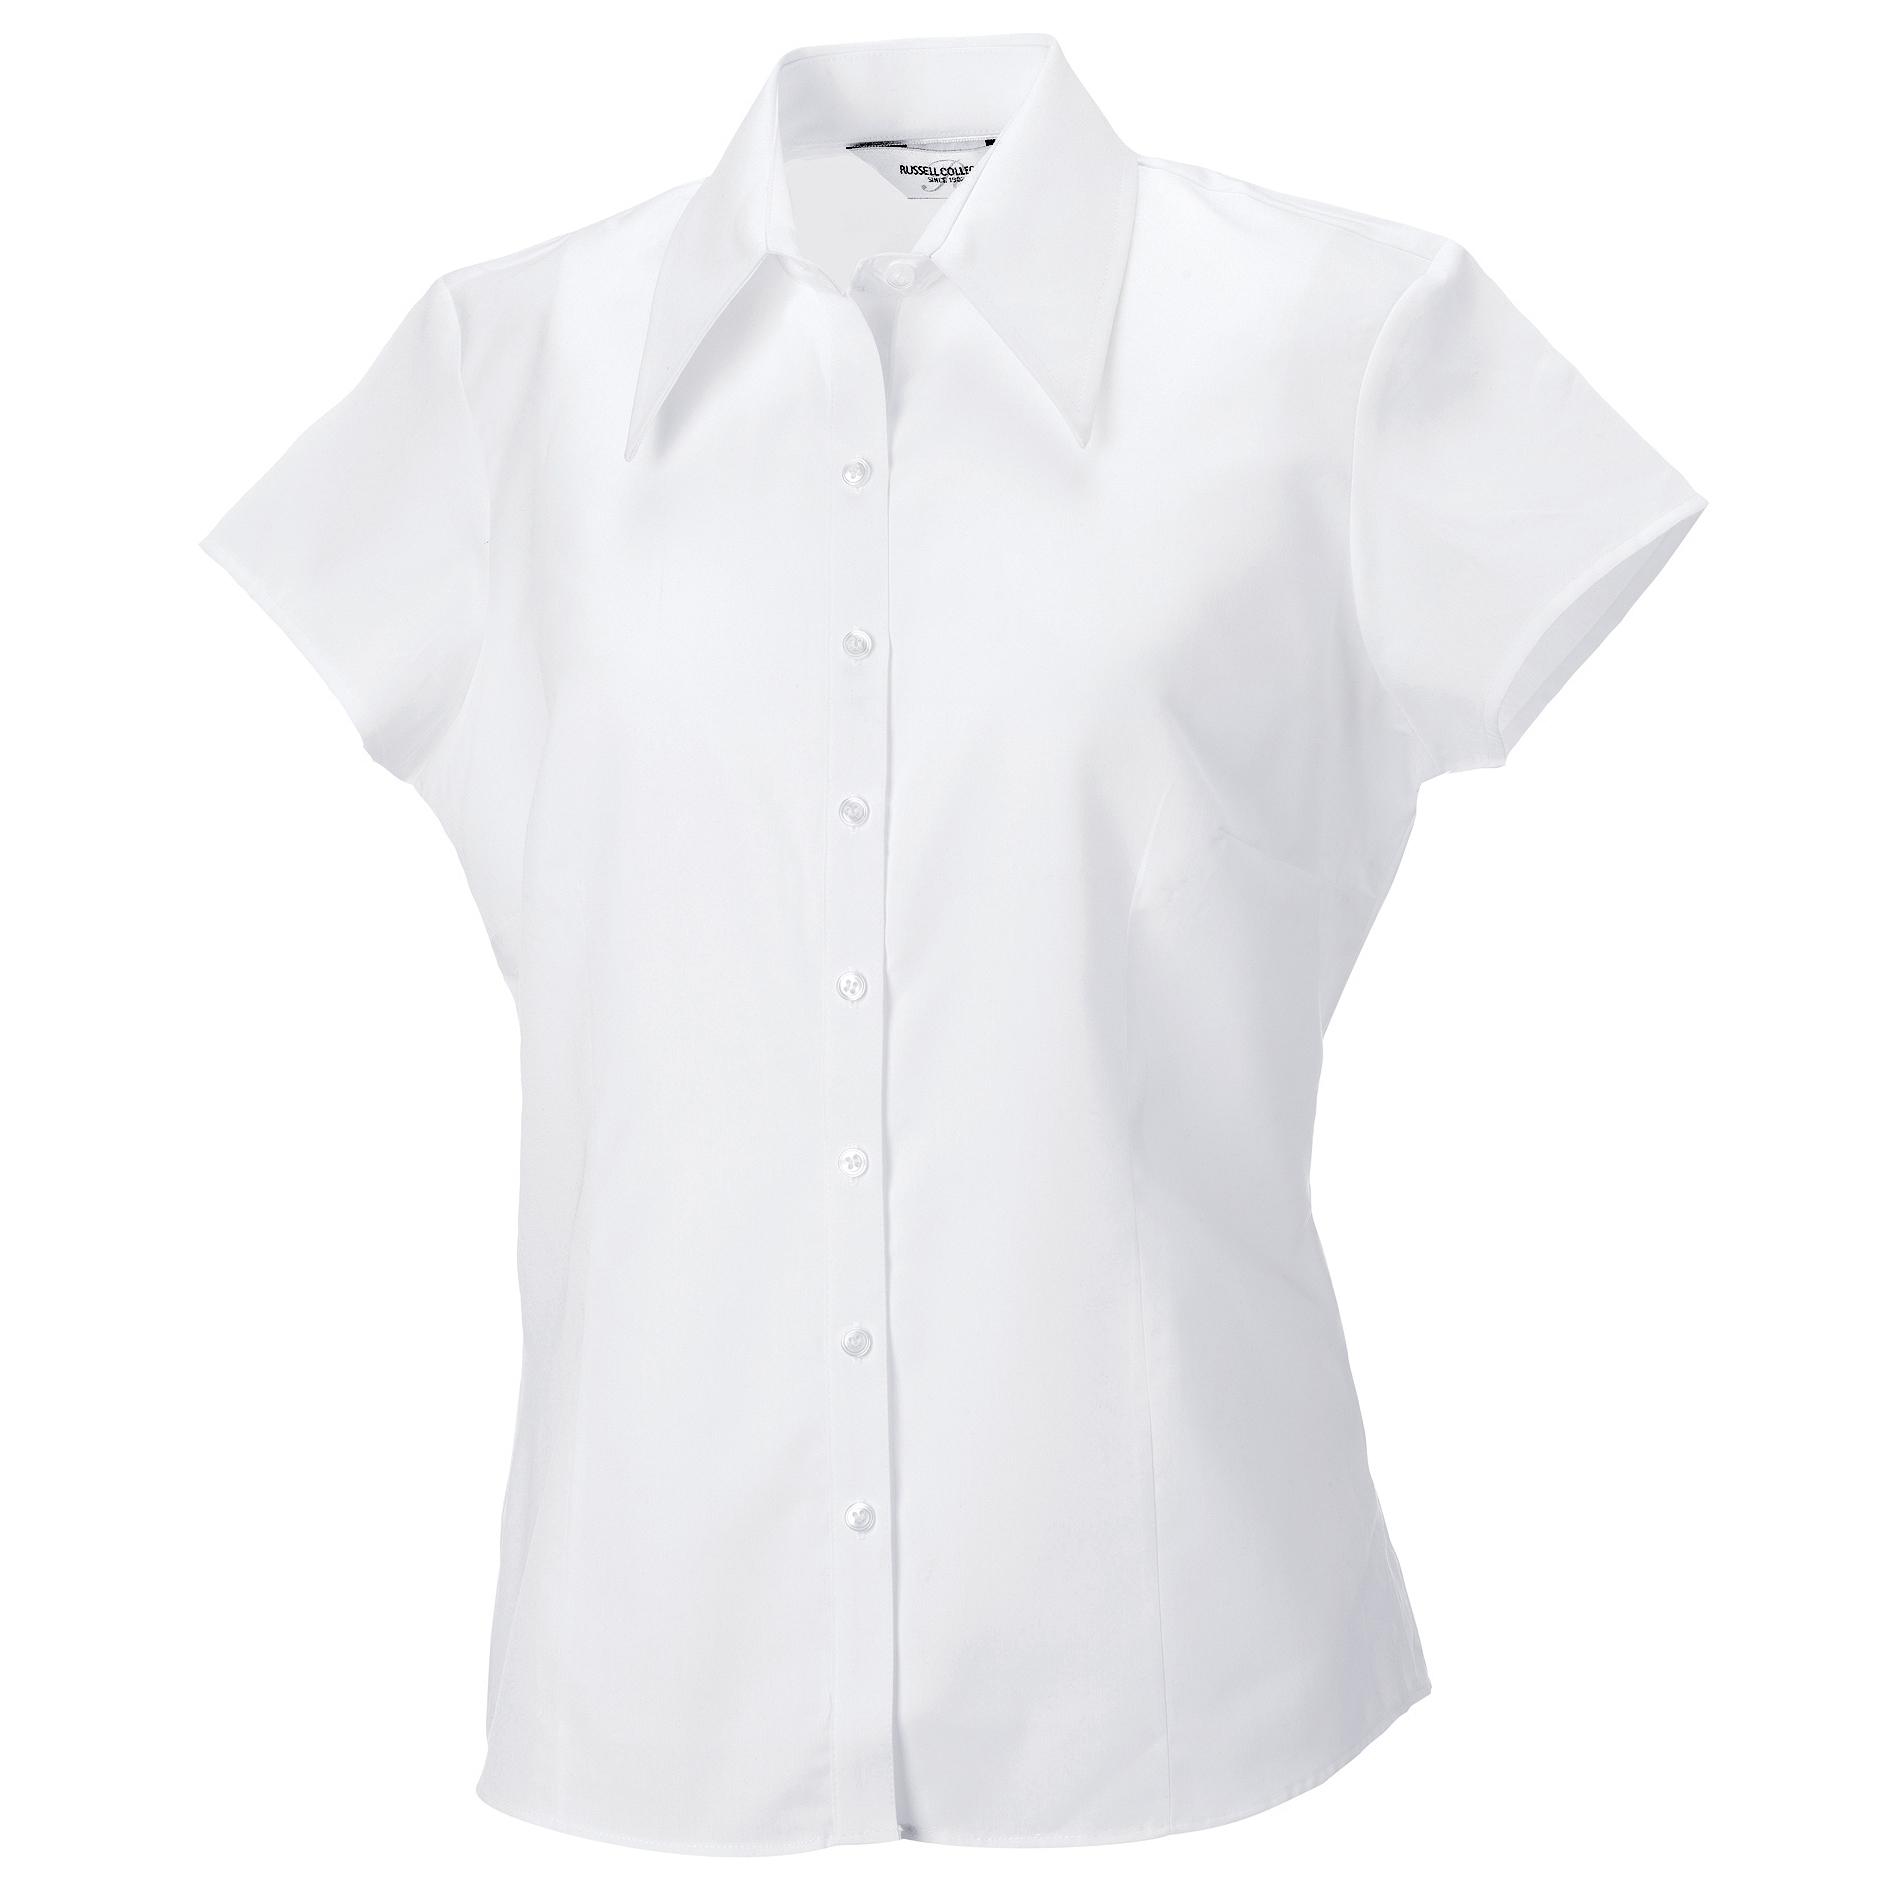 Russell Kurzarmbluse Collection Damen Bluse Kurzarm´ tailliert